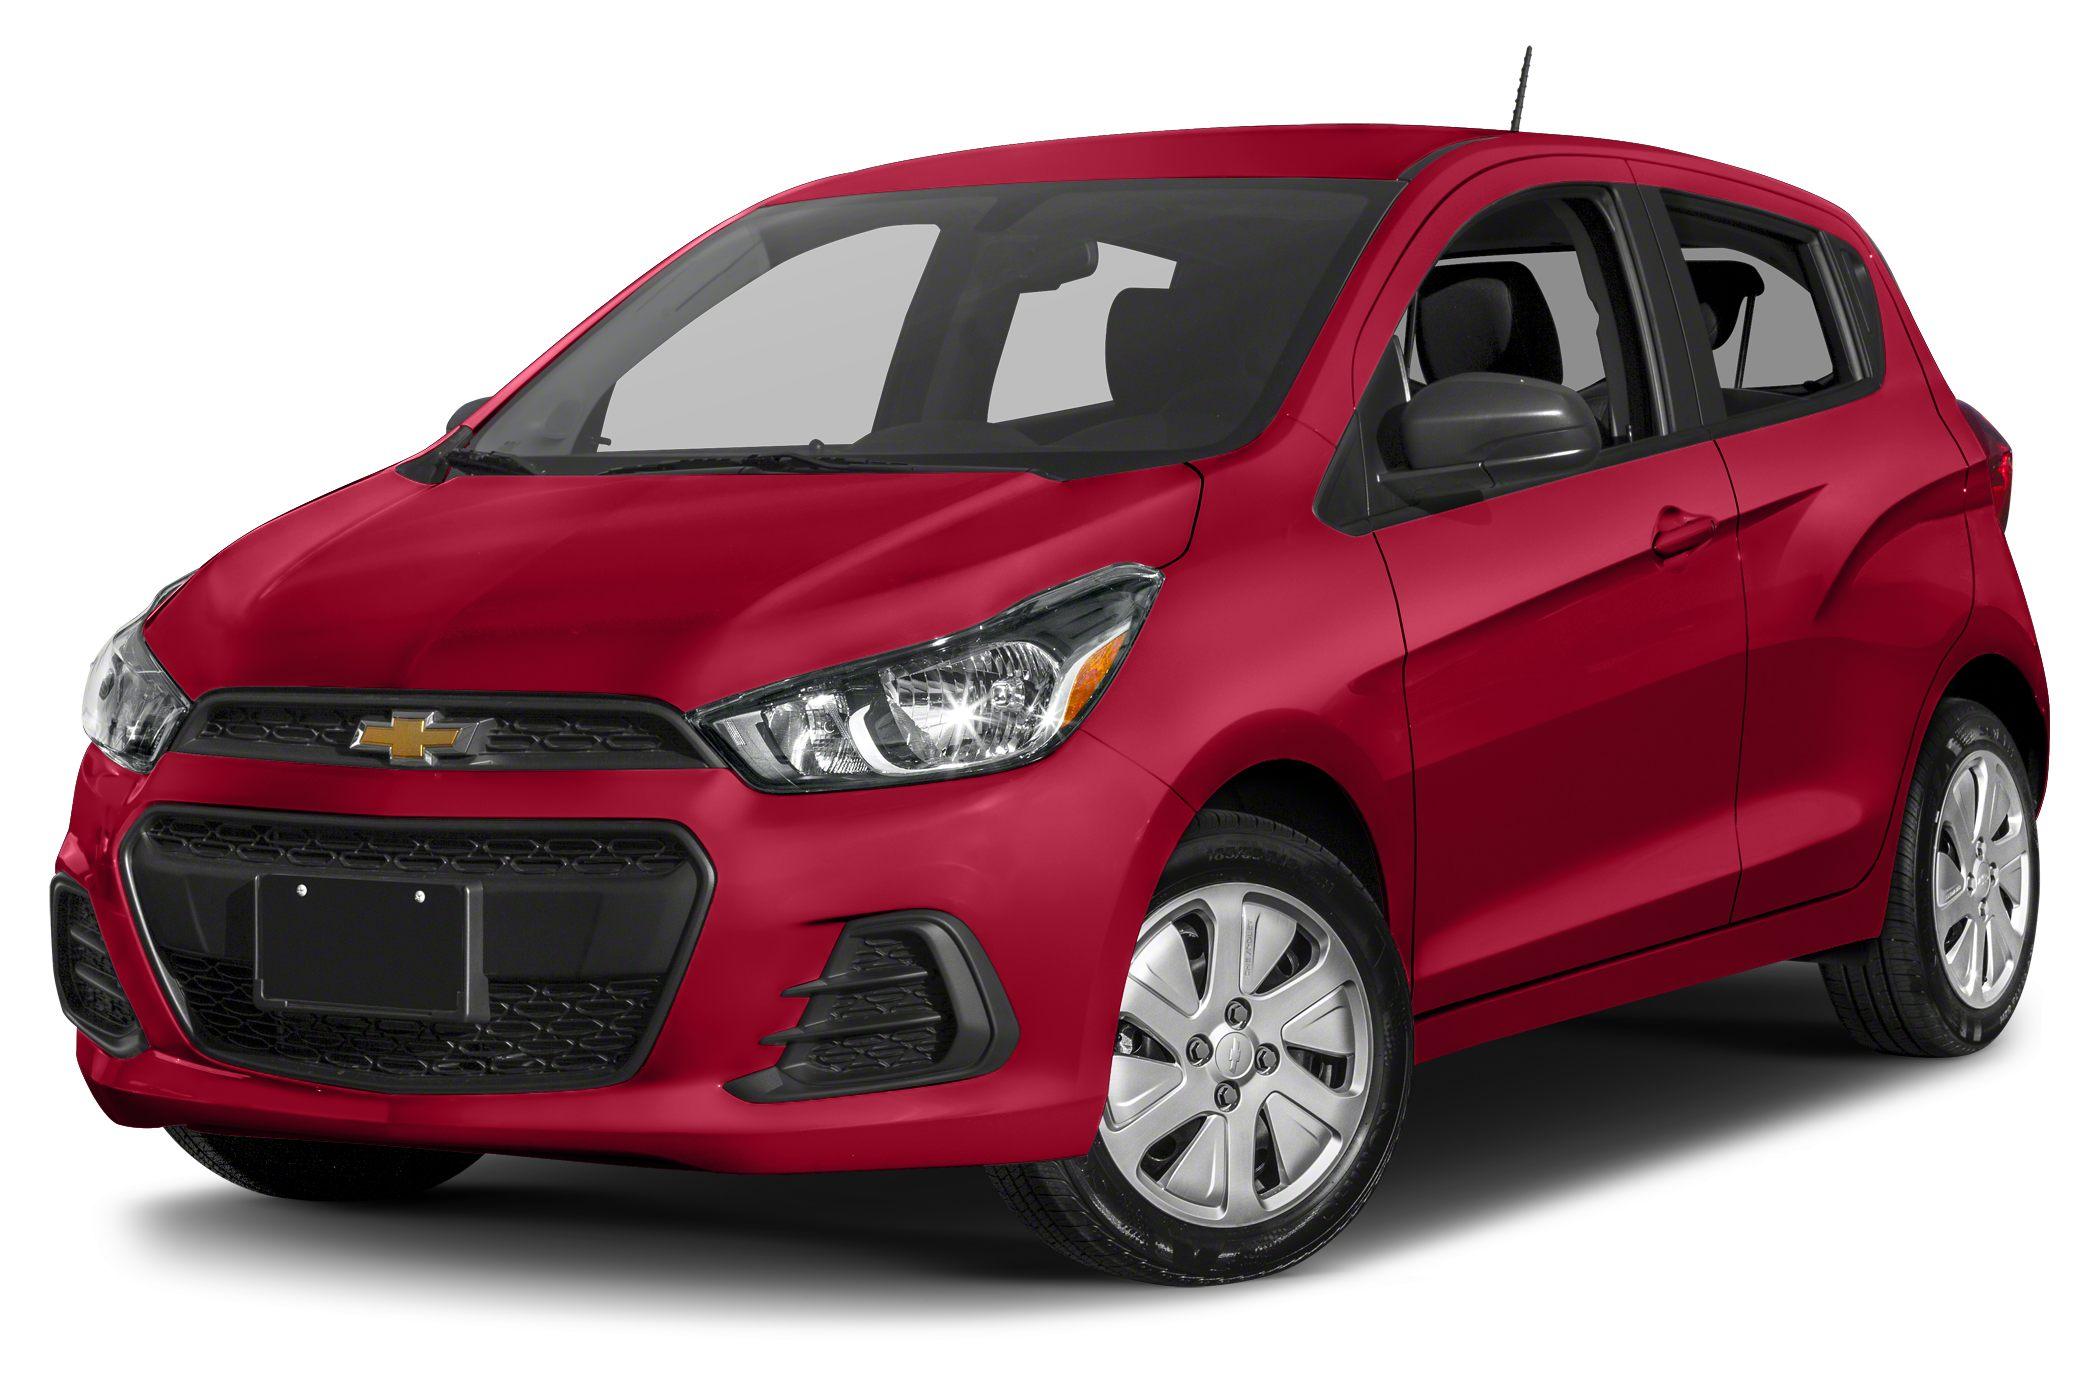 Model Of Cars Names >> 2018 Chevrolet Spark Specs, Pictures, Trims, Colors || Cars.com